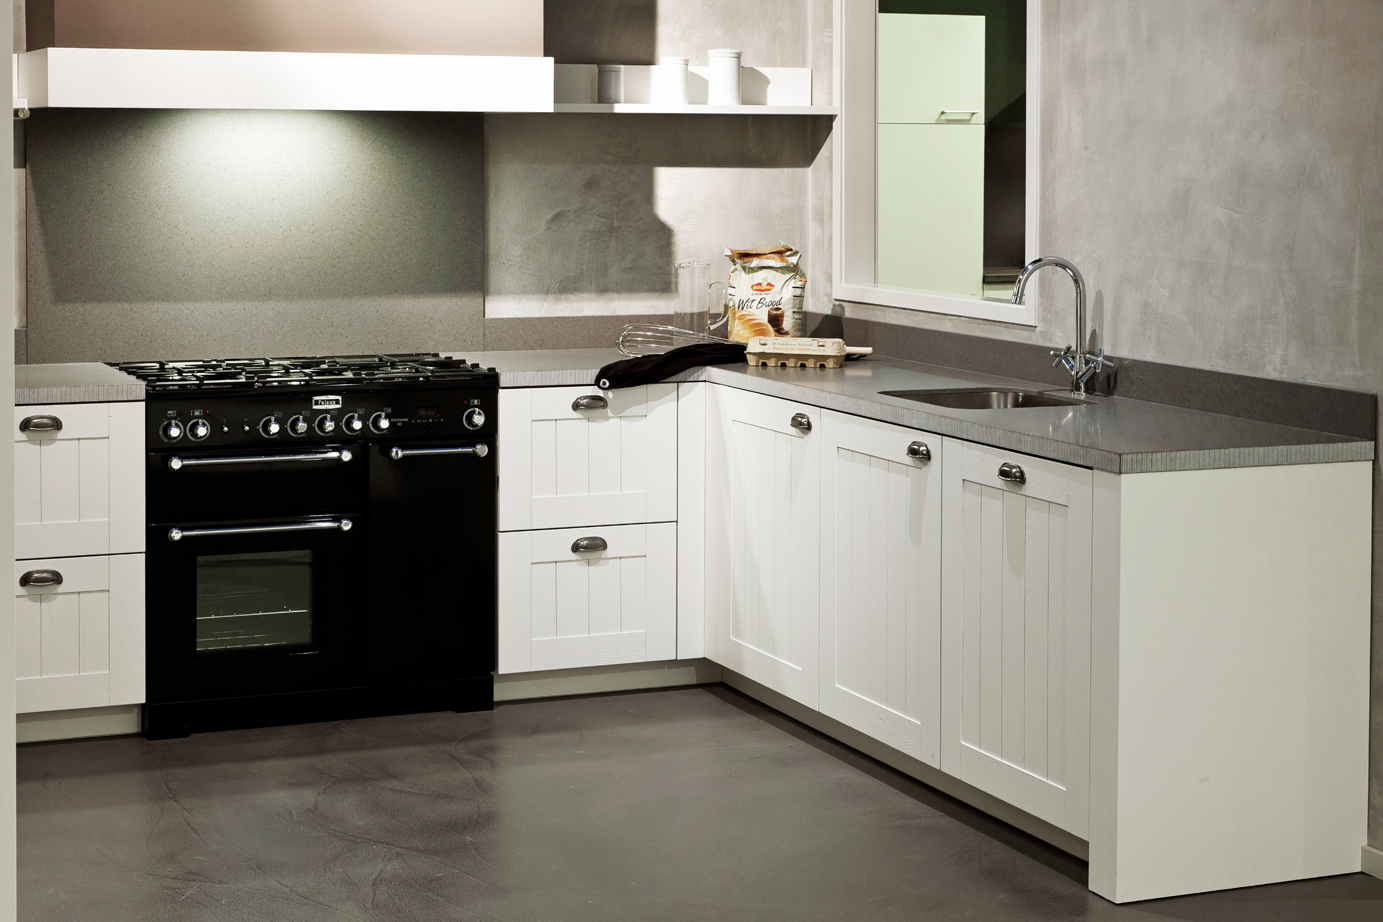 Keuken lampen design xnovinky landelijk keuken lampen plafond verlichting led en energie - Design keuken plafond ...